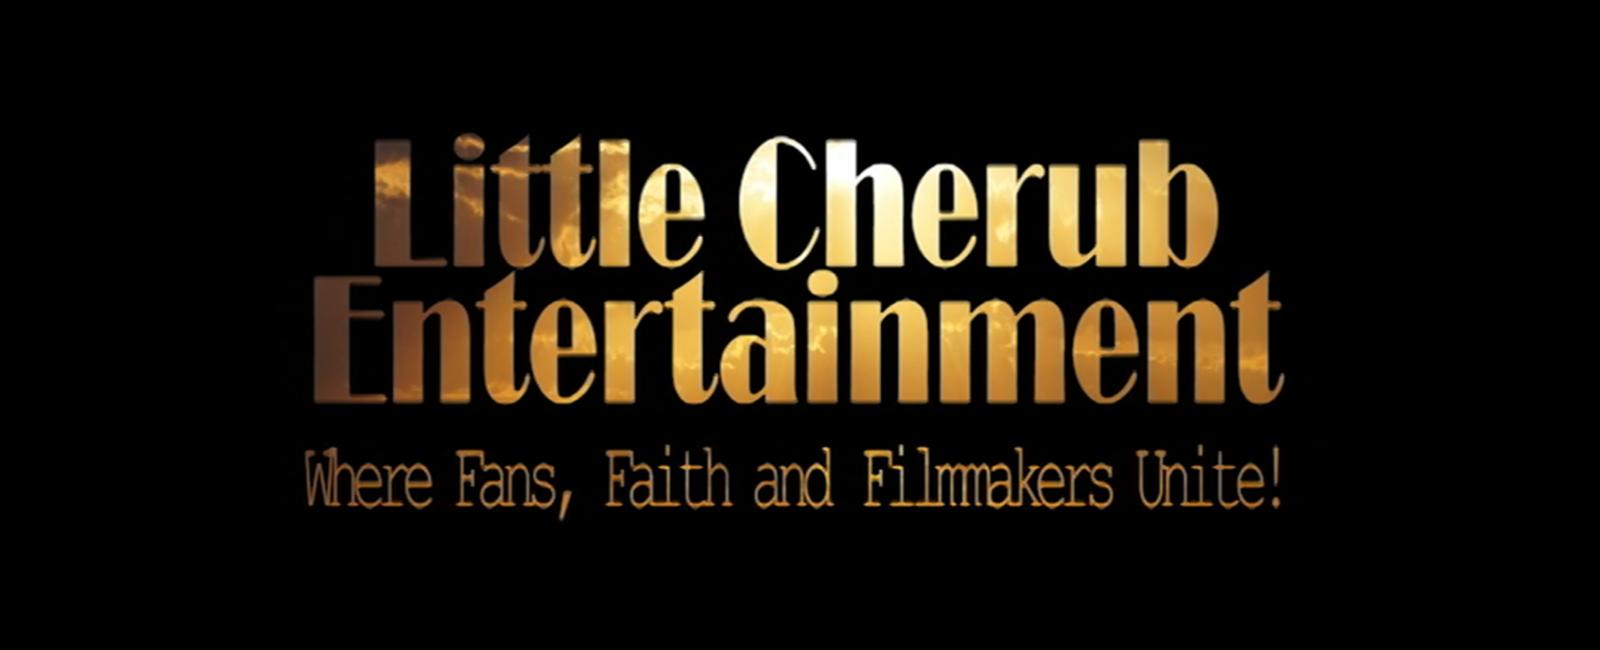 Little Cherub Entertainment